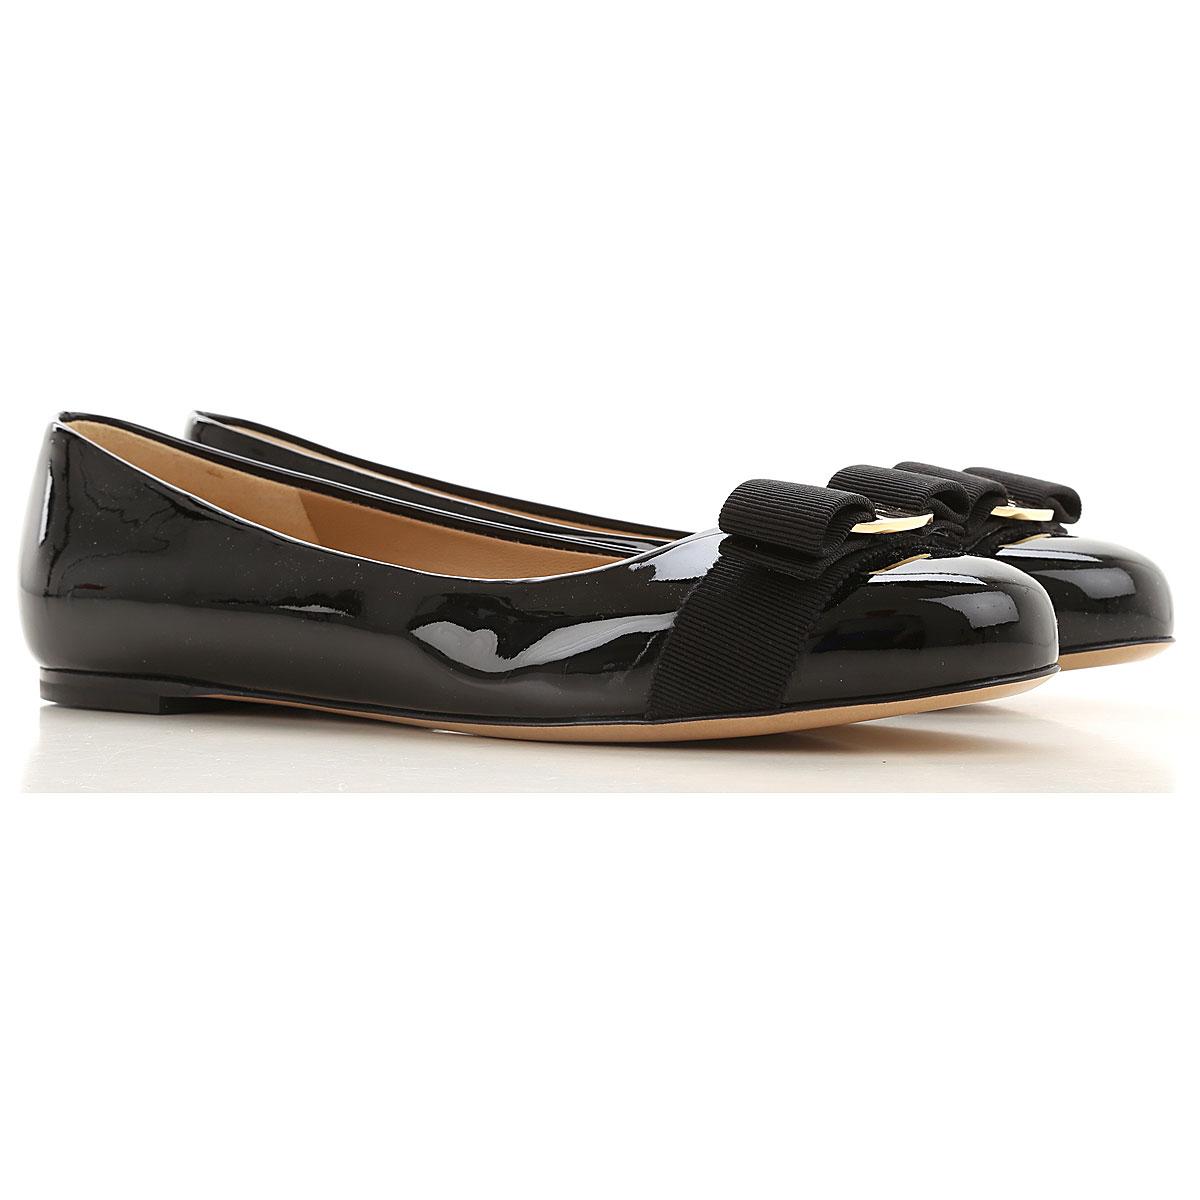 Salvatore Ferragamo Ballet Flats Ballerina Shoes for Women On Sale, Black, Patent Leather, 2019, 5 5.5